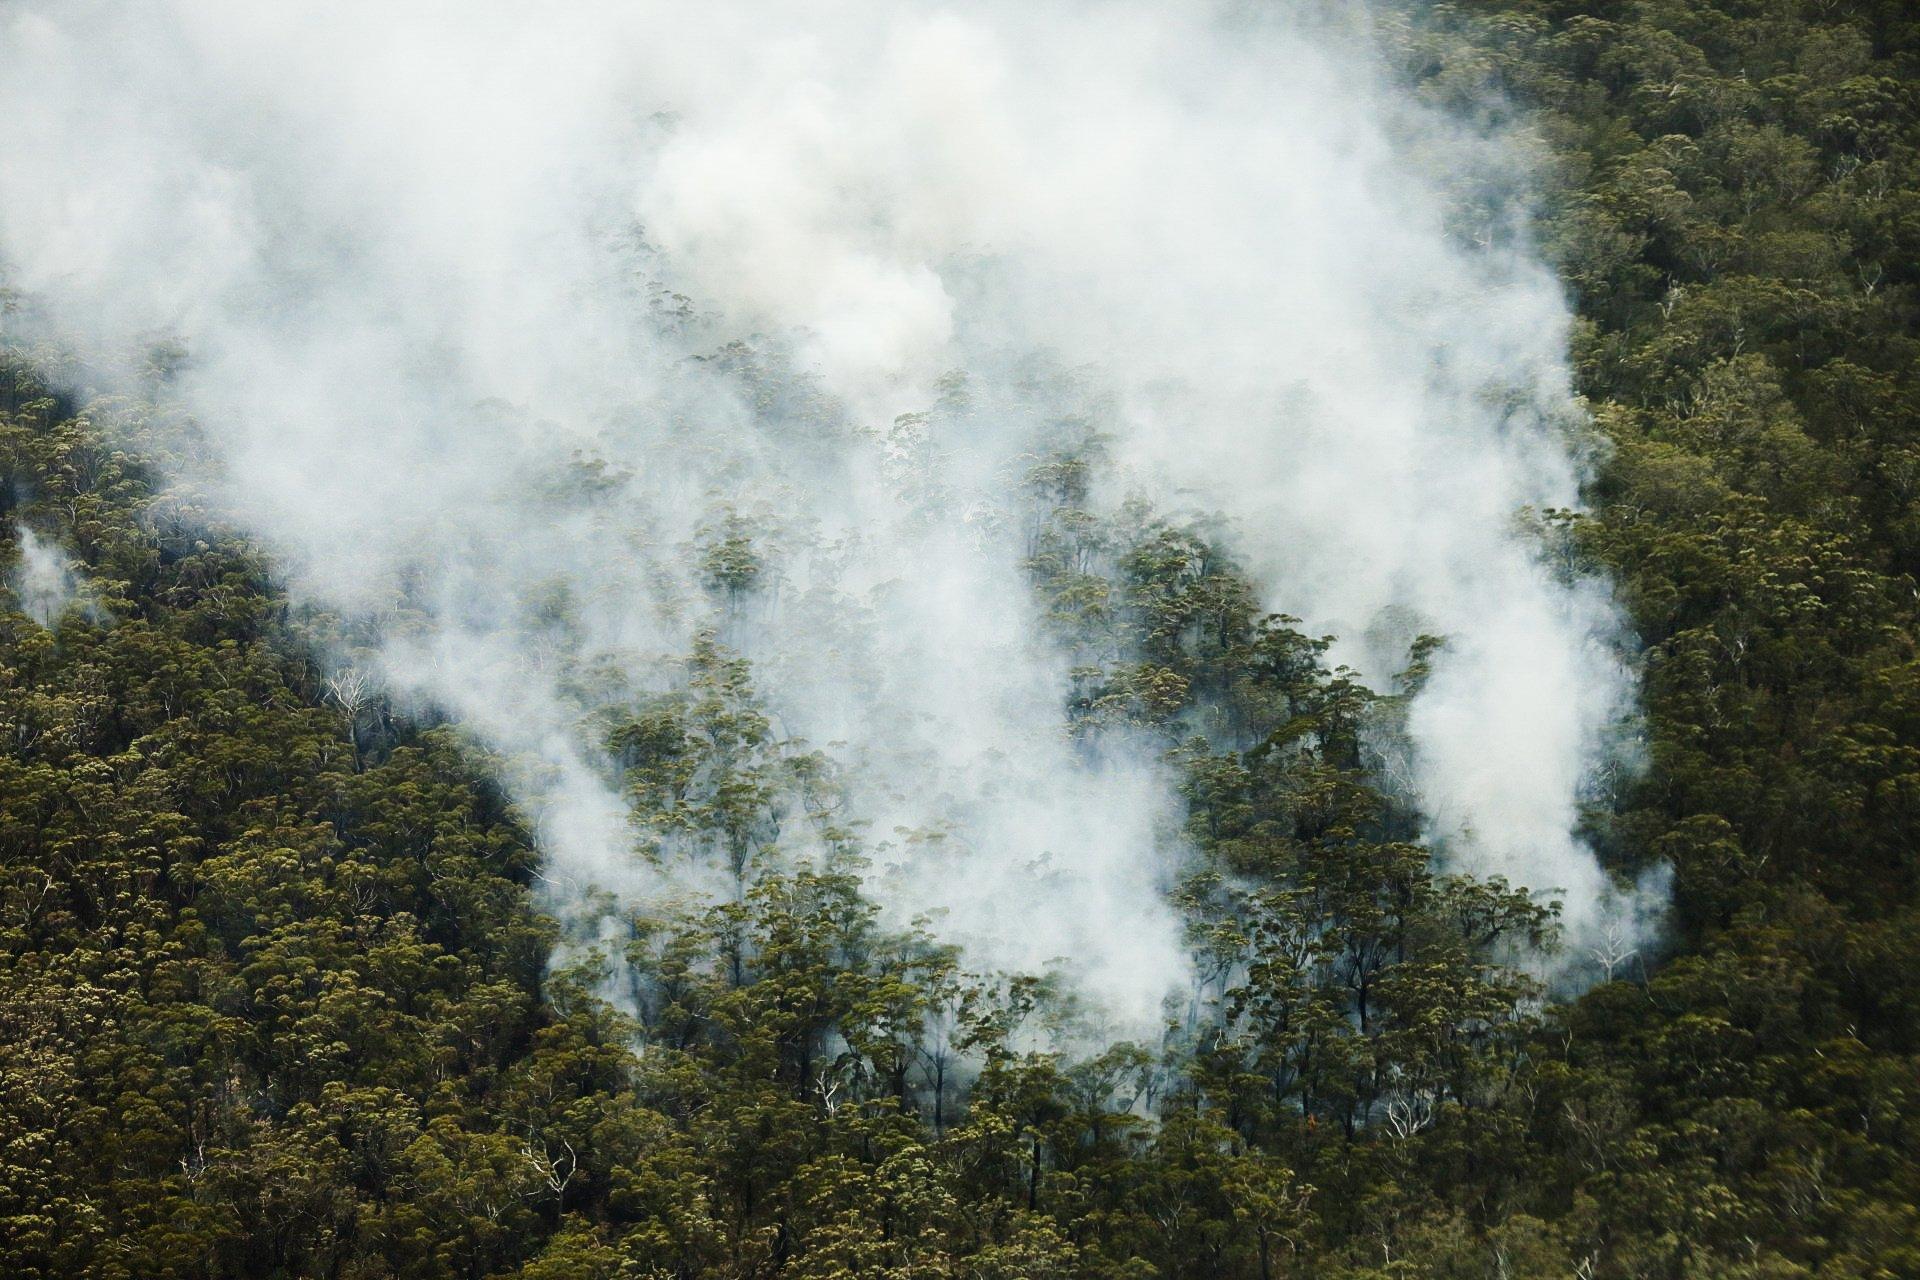 DR_2020-02-21_EastGippsland-Victoria-Australia_Bushfires-AerialFlight-DELWP_StaceyHedman_IMG_8942.jpg